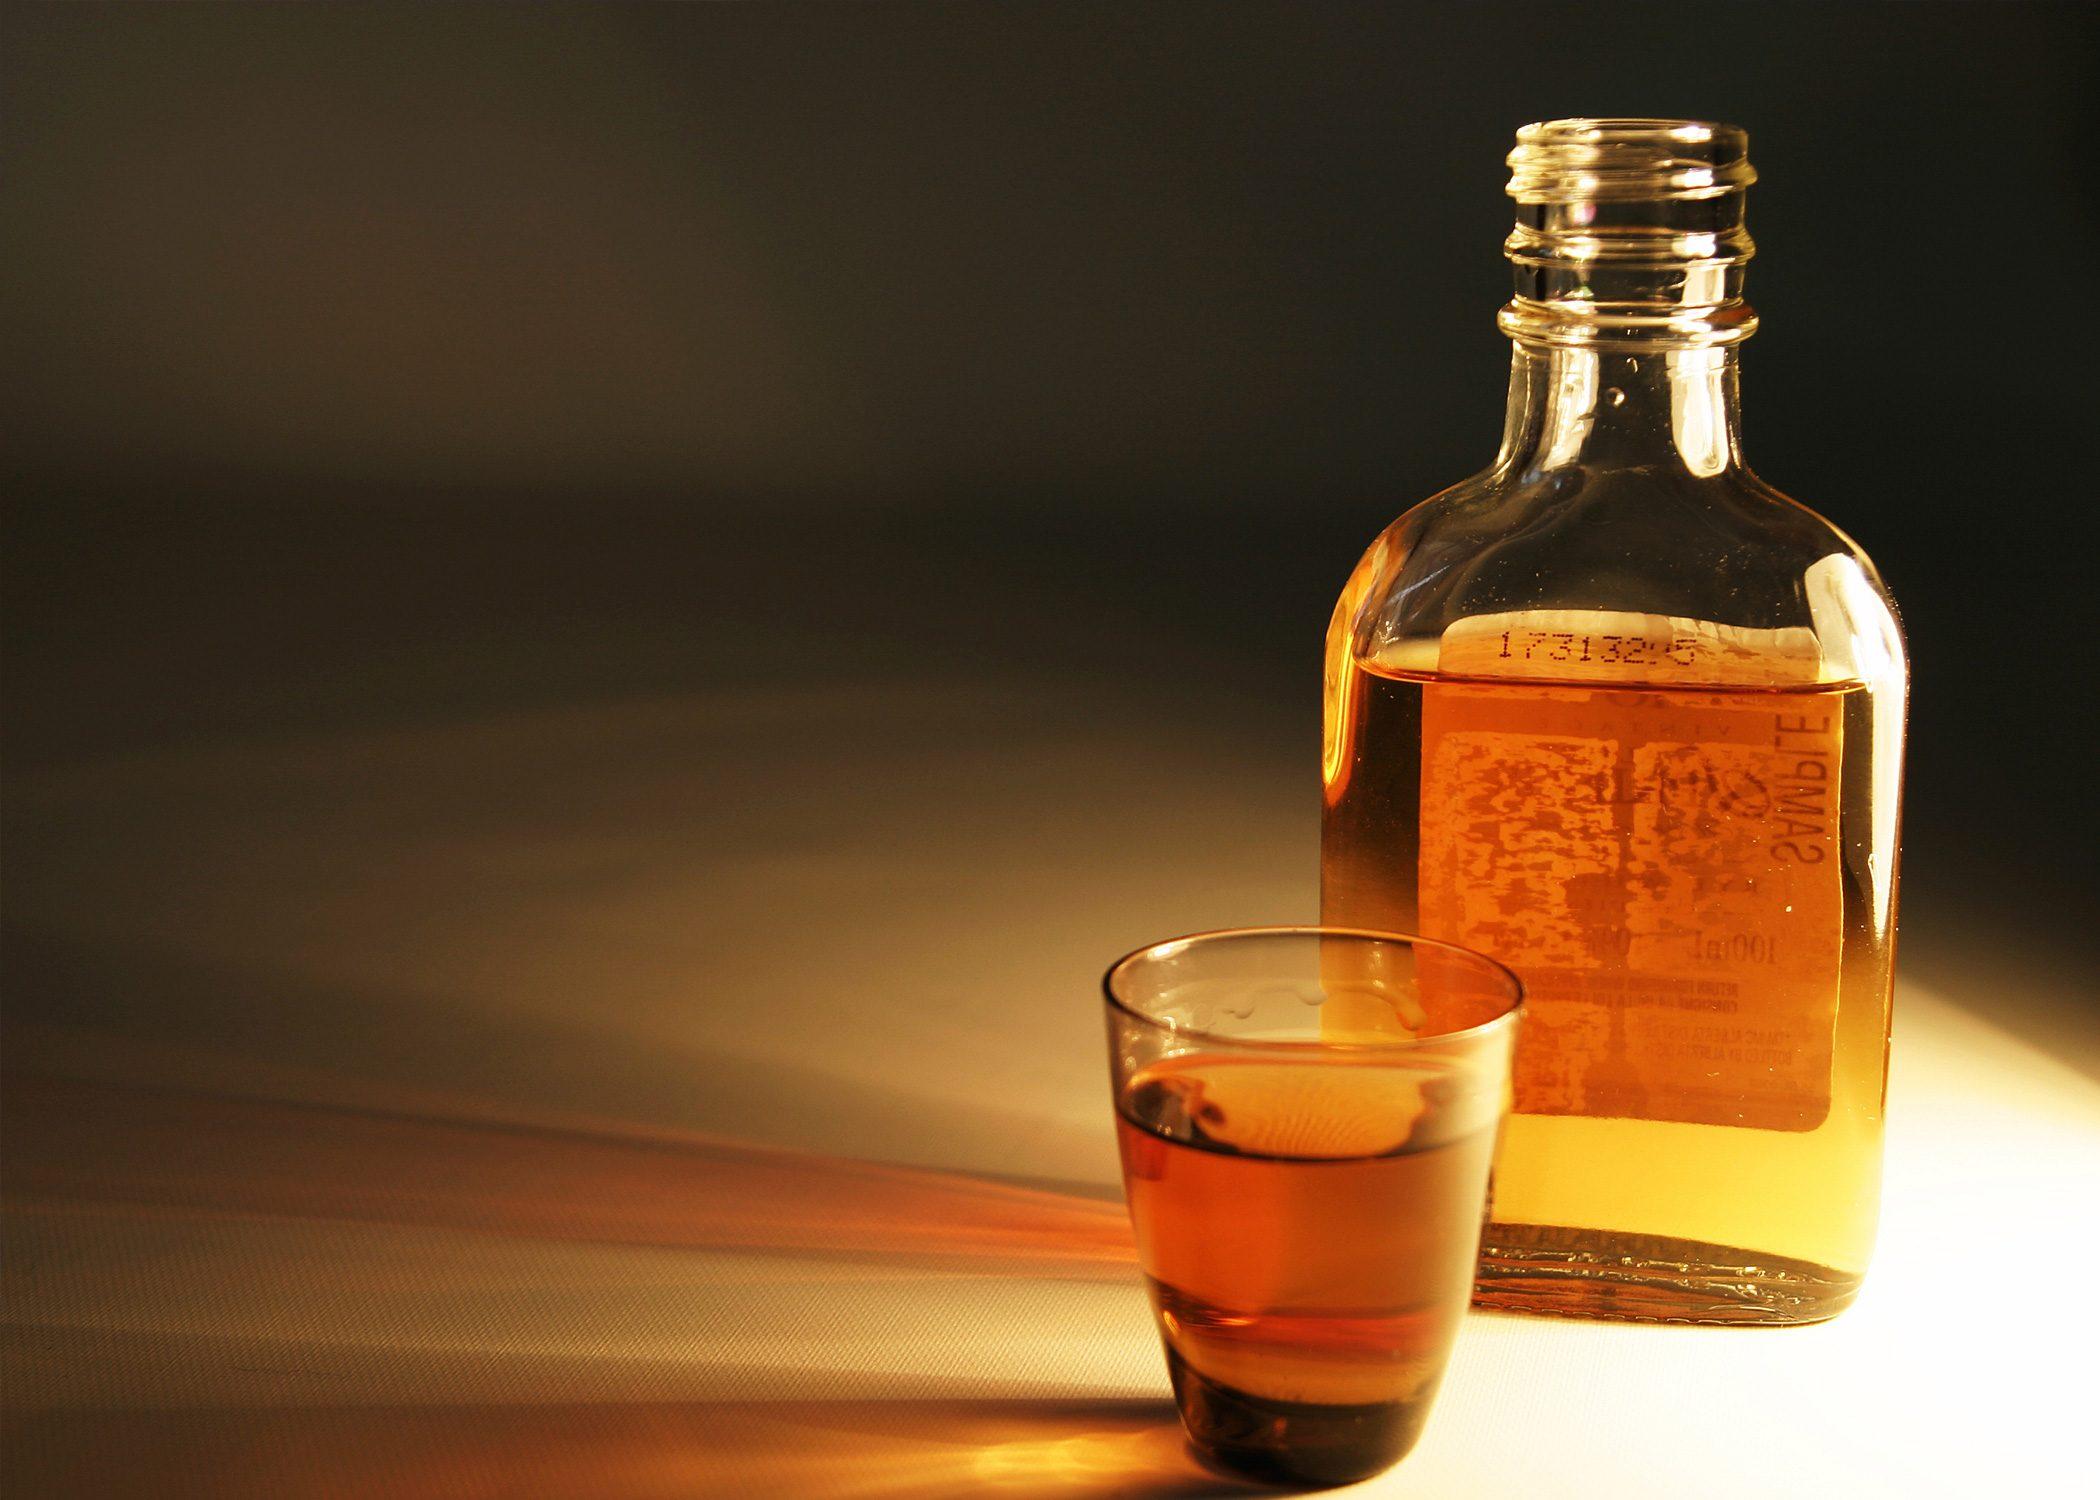 Nix the Nightcap: Alcohol Doesn't Help You Sleep